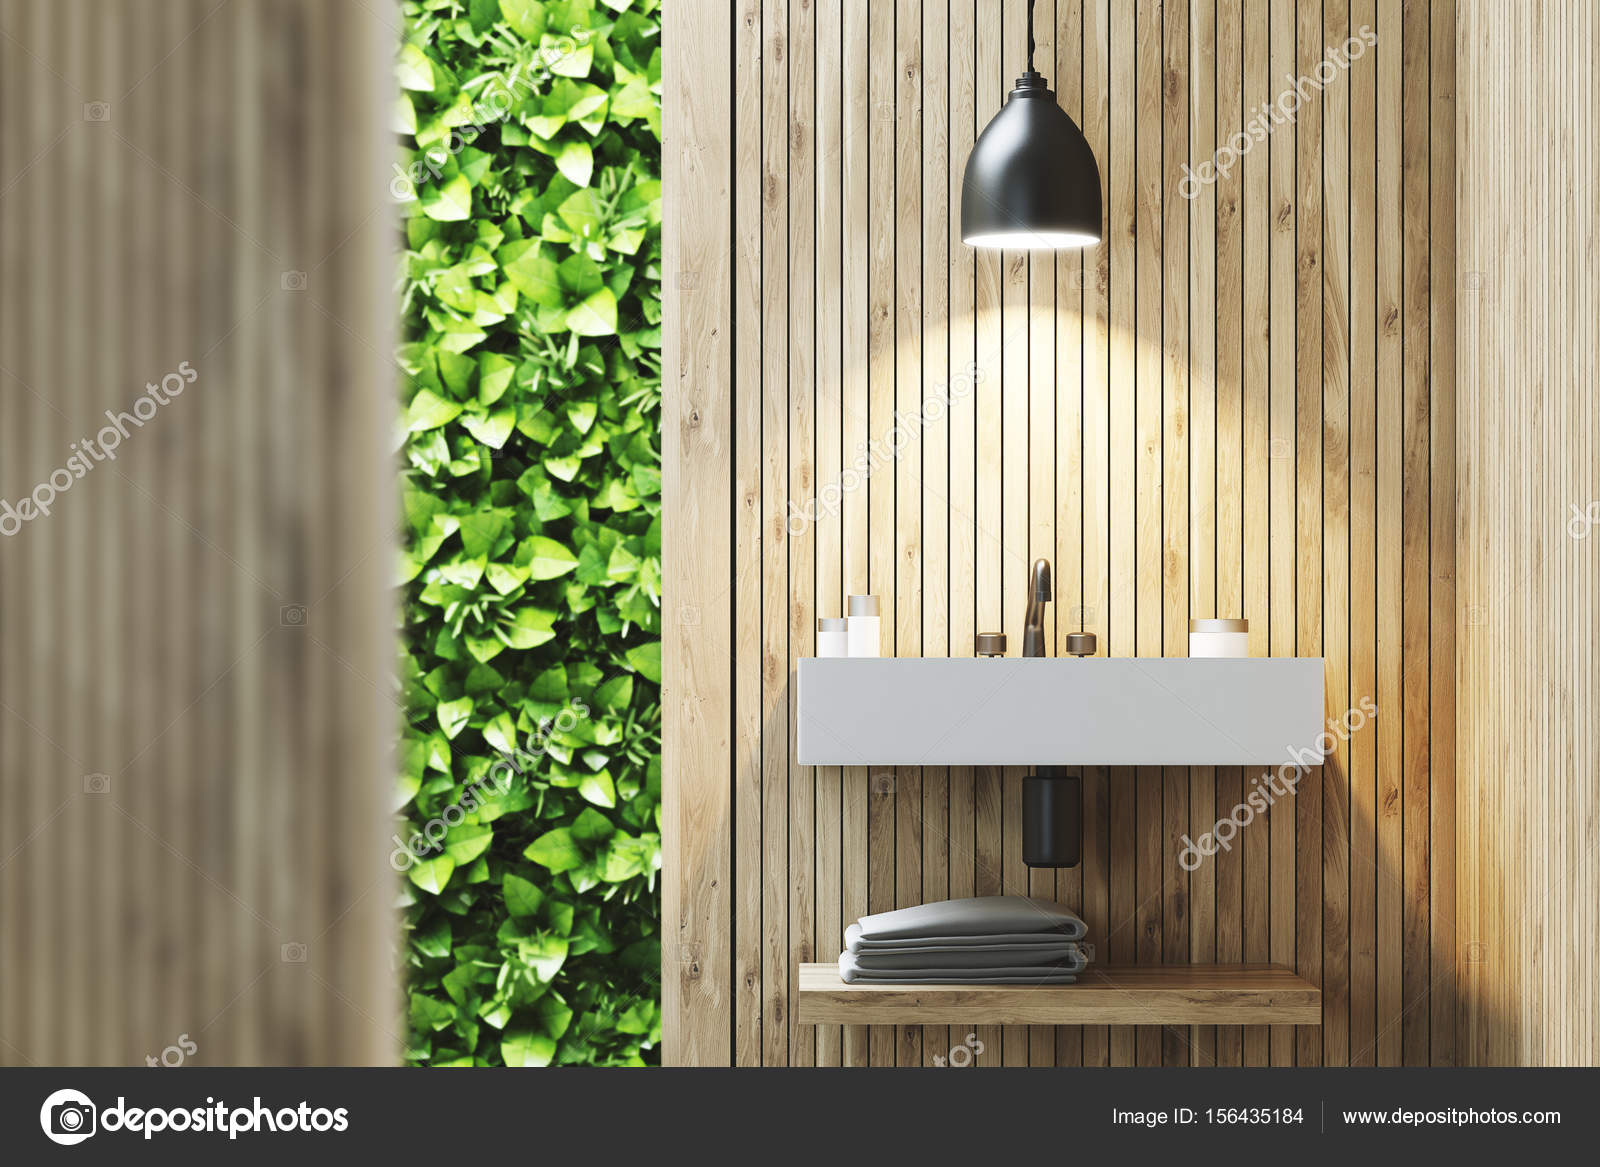 Eco badkamer met wastafel hout u2014 stockfoto © denisismagilov #156435184